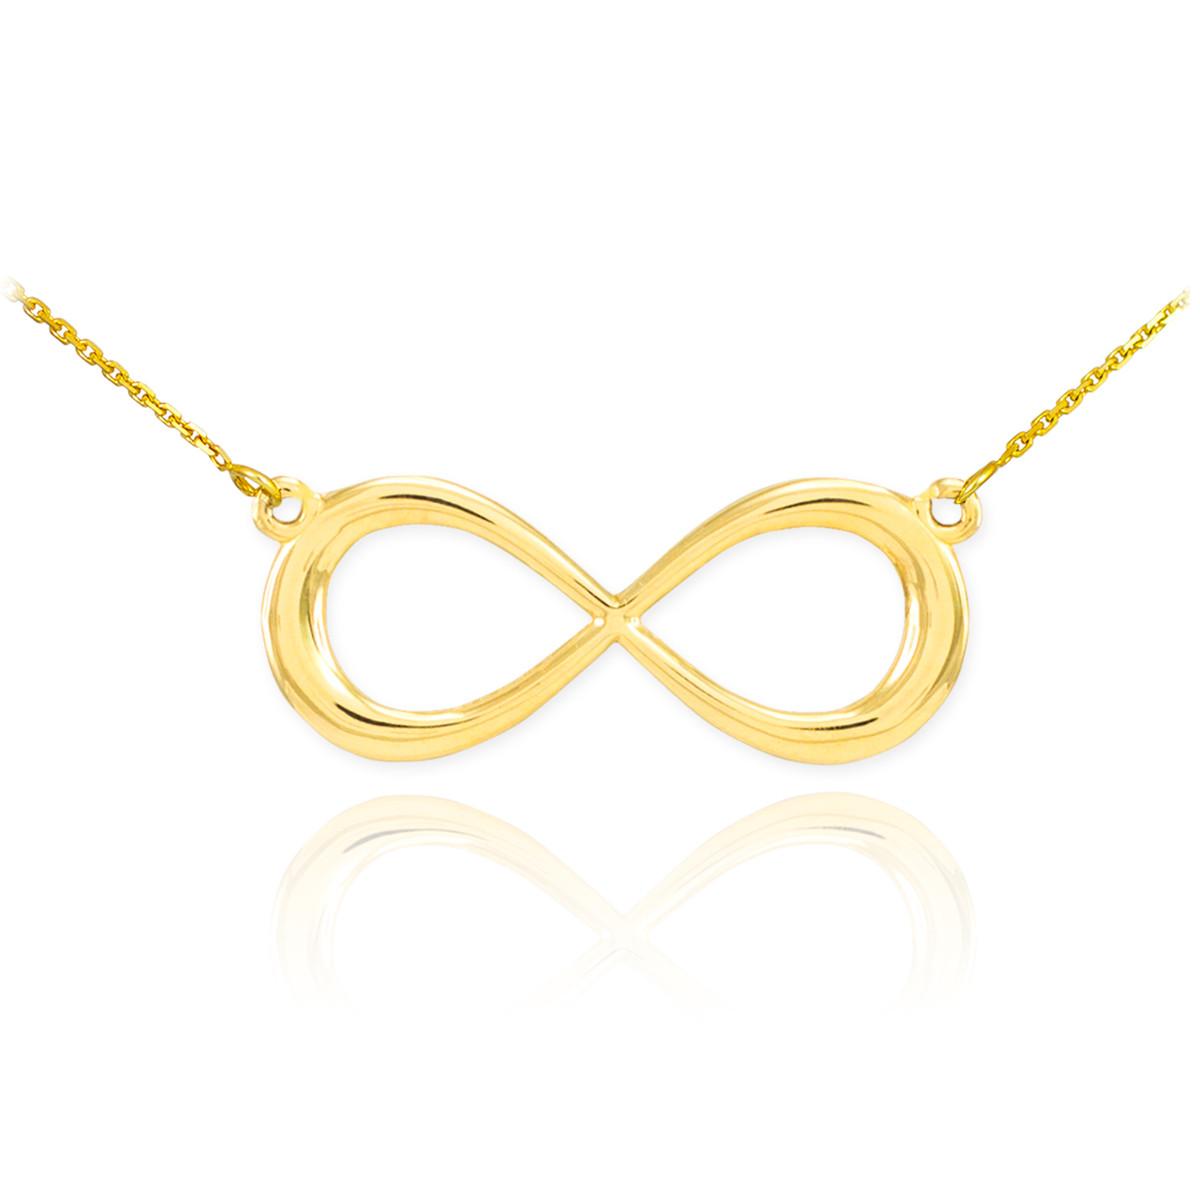 14k yellow gold fashion dainty infinity sign pendant